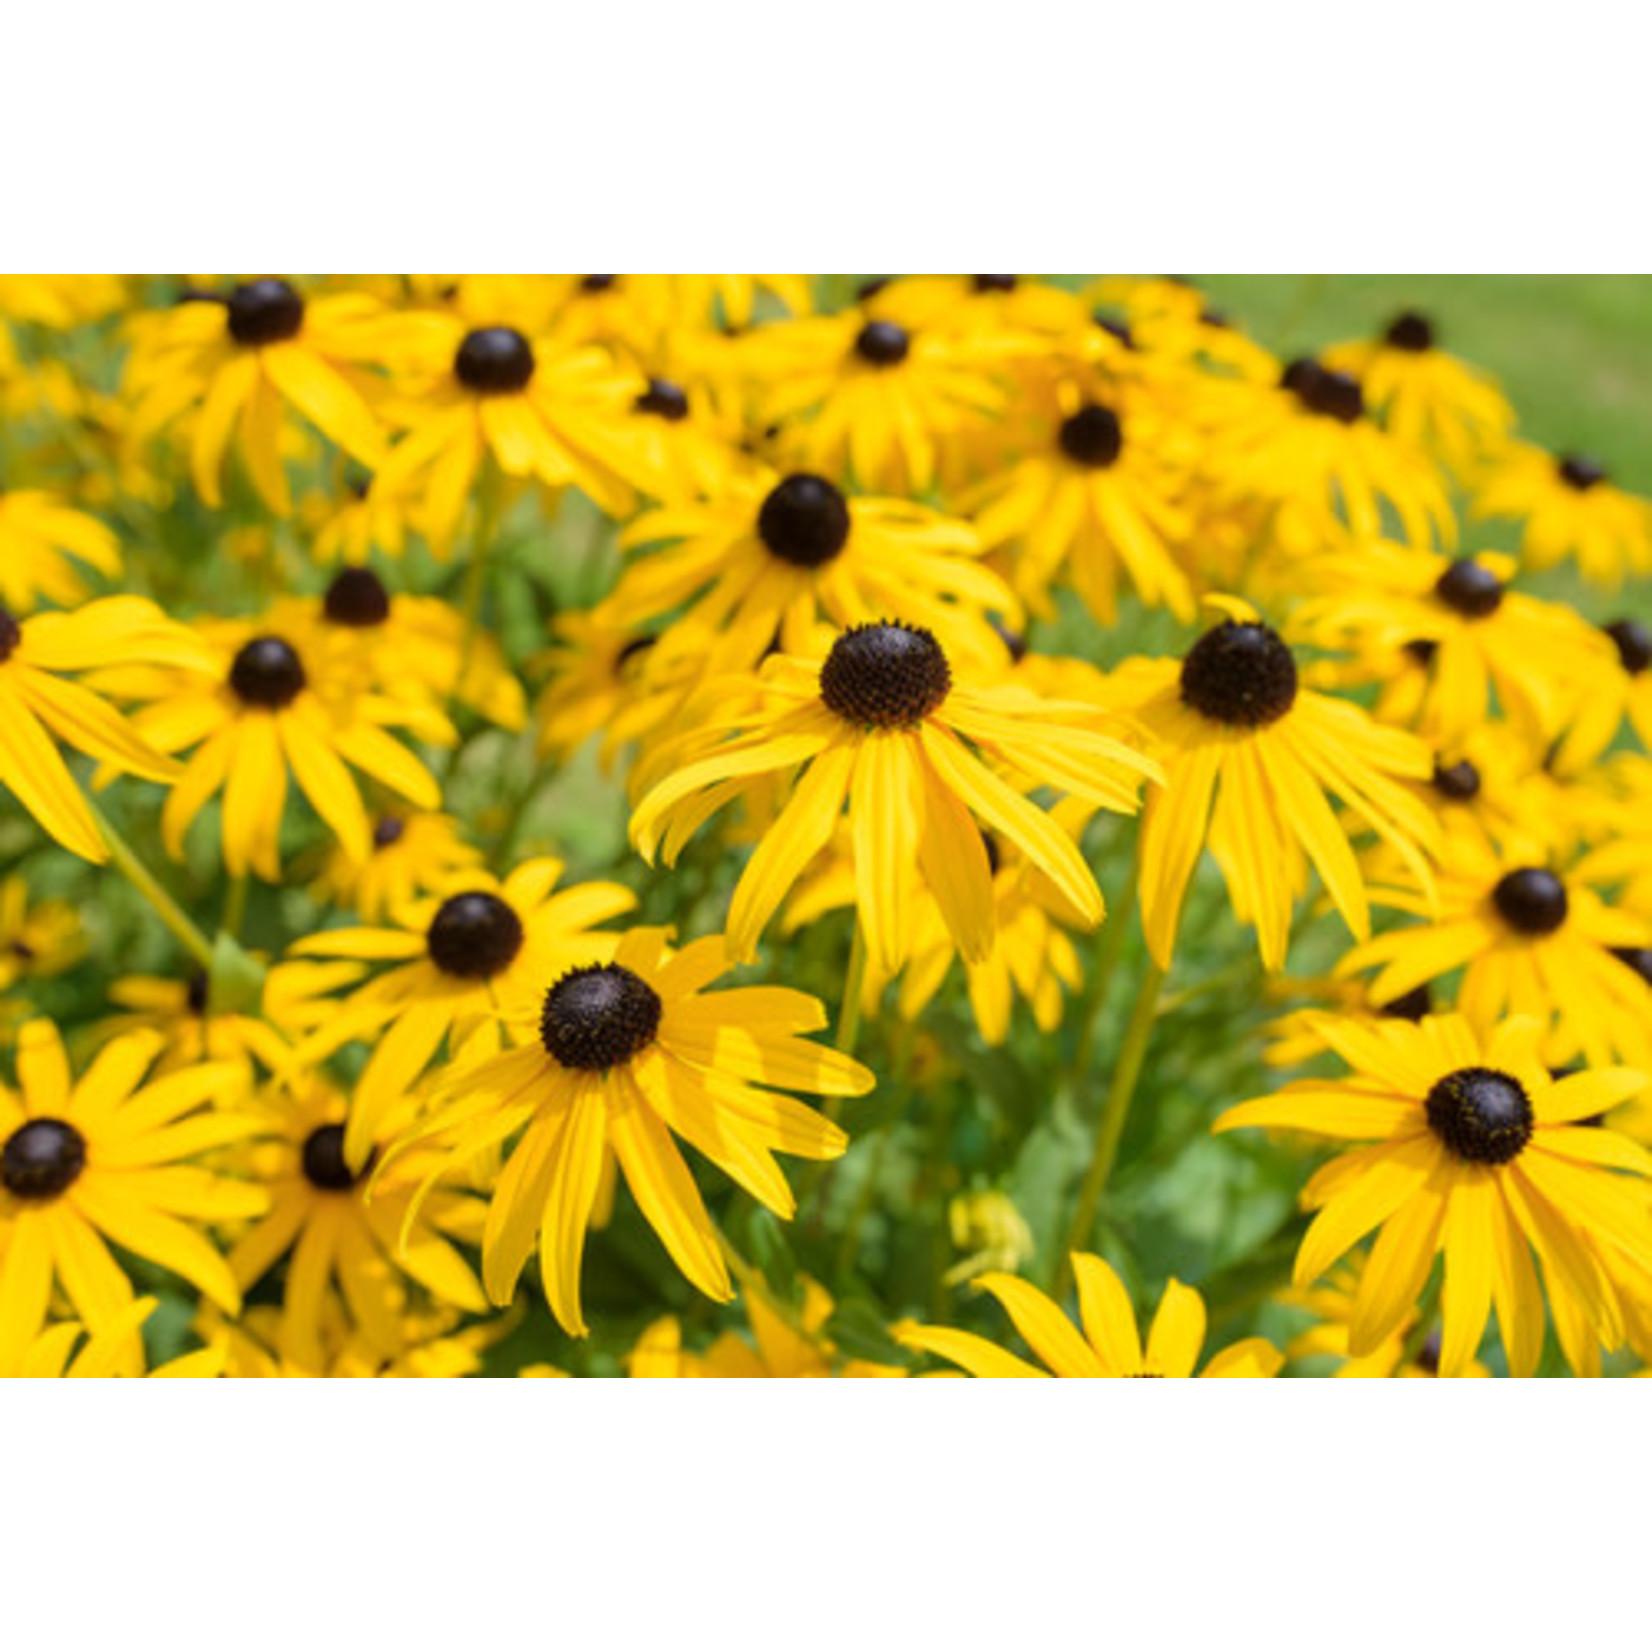 Rudbeckia (seed pkg) - Black Eyed Susan